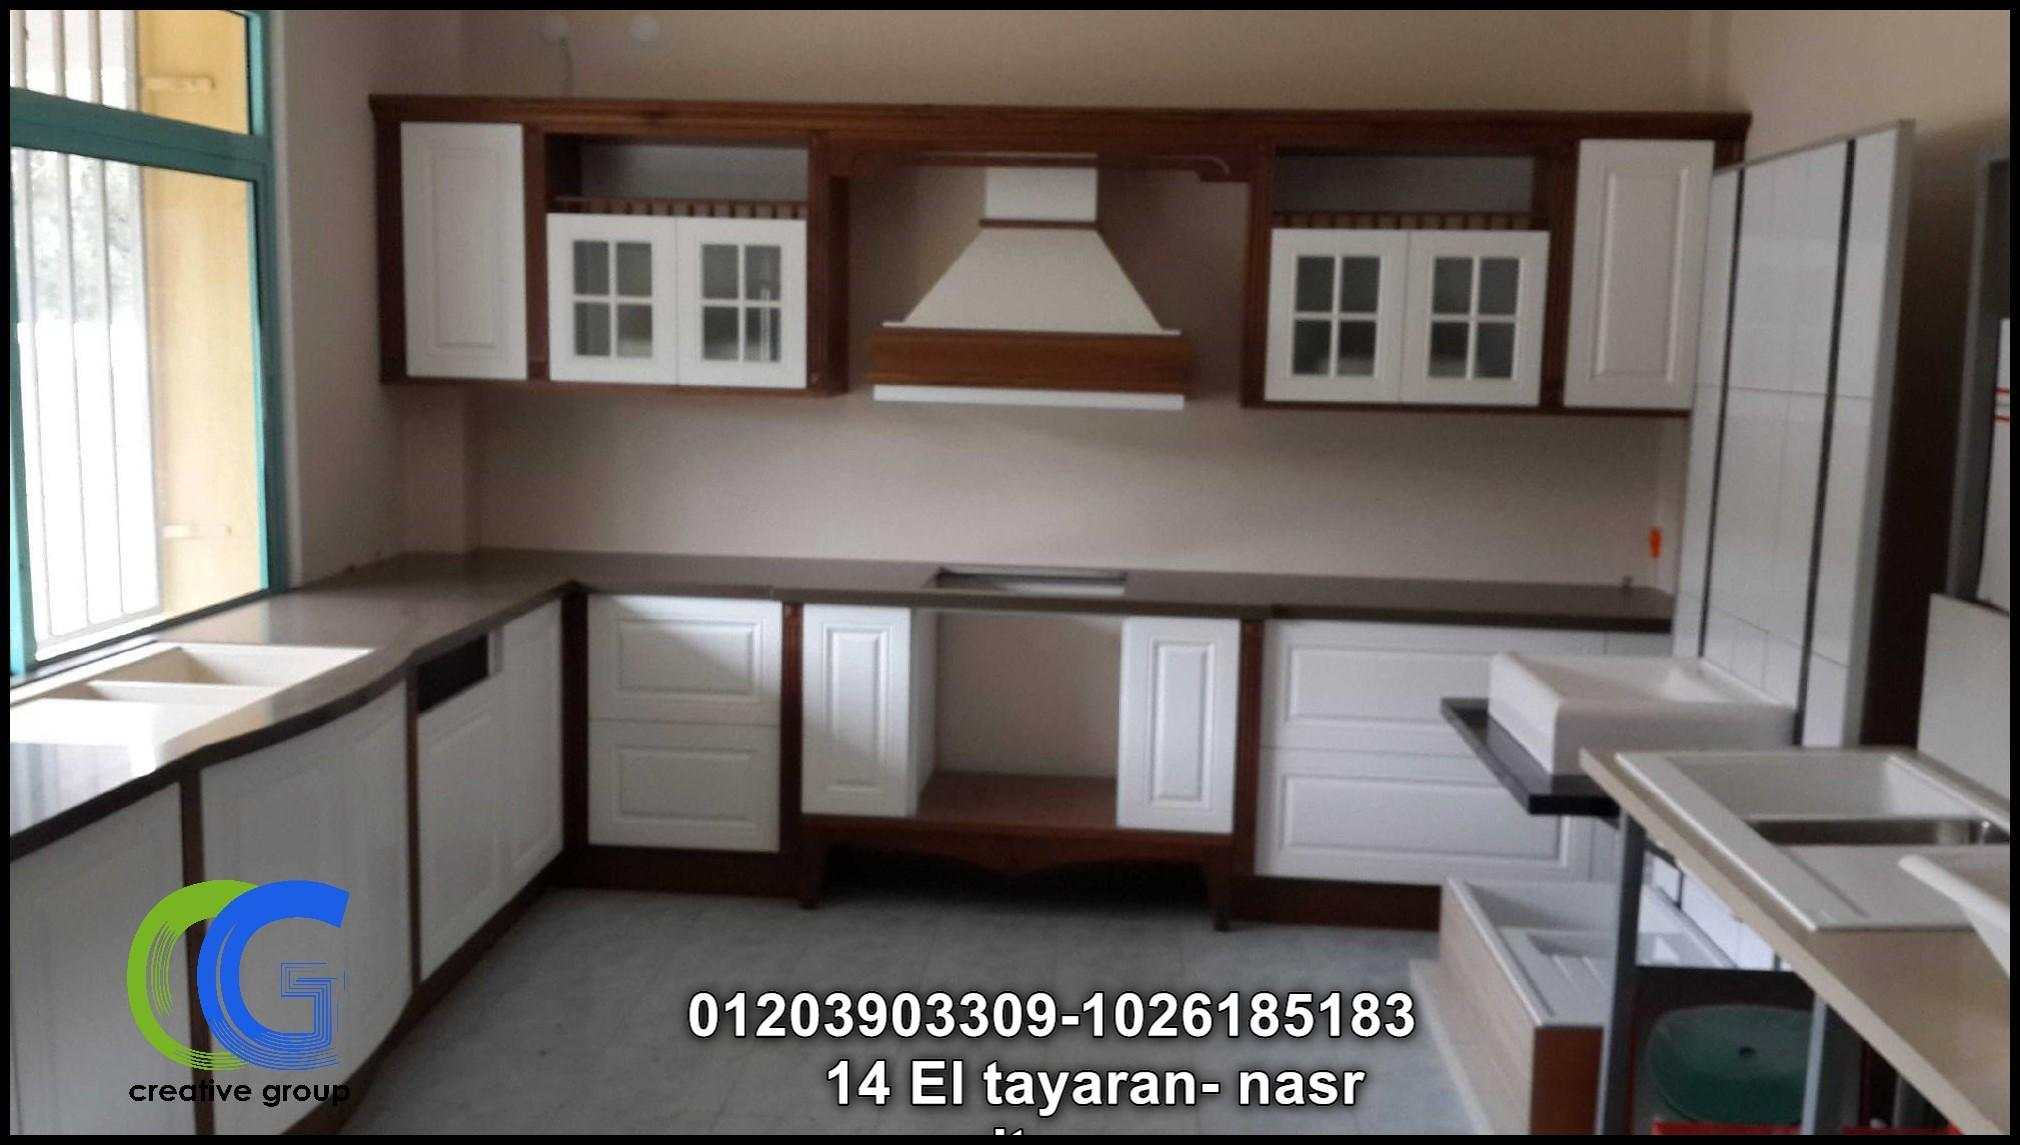 مطبخ خشب ( اسعار مميزة )- كرياتف جروب 01203903309  522574273